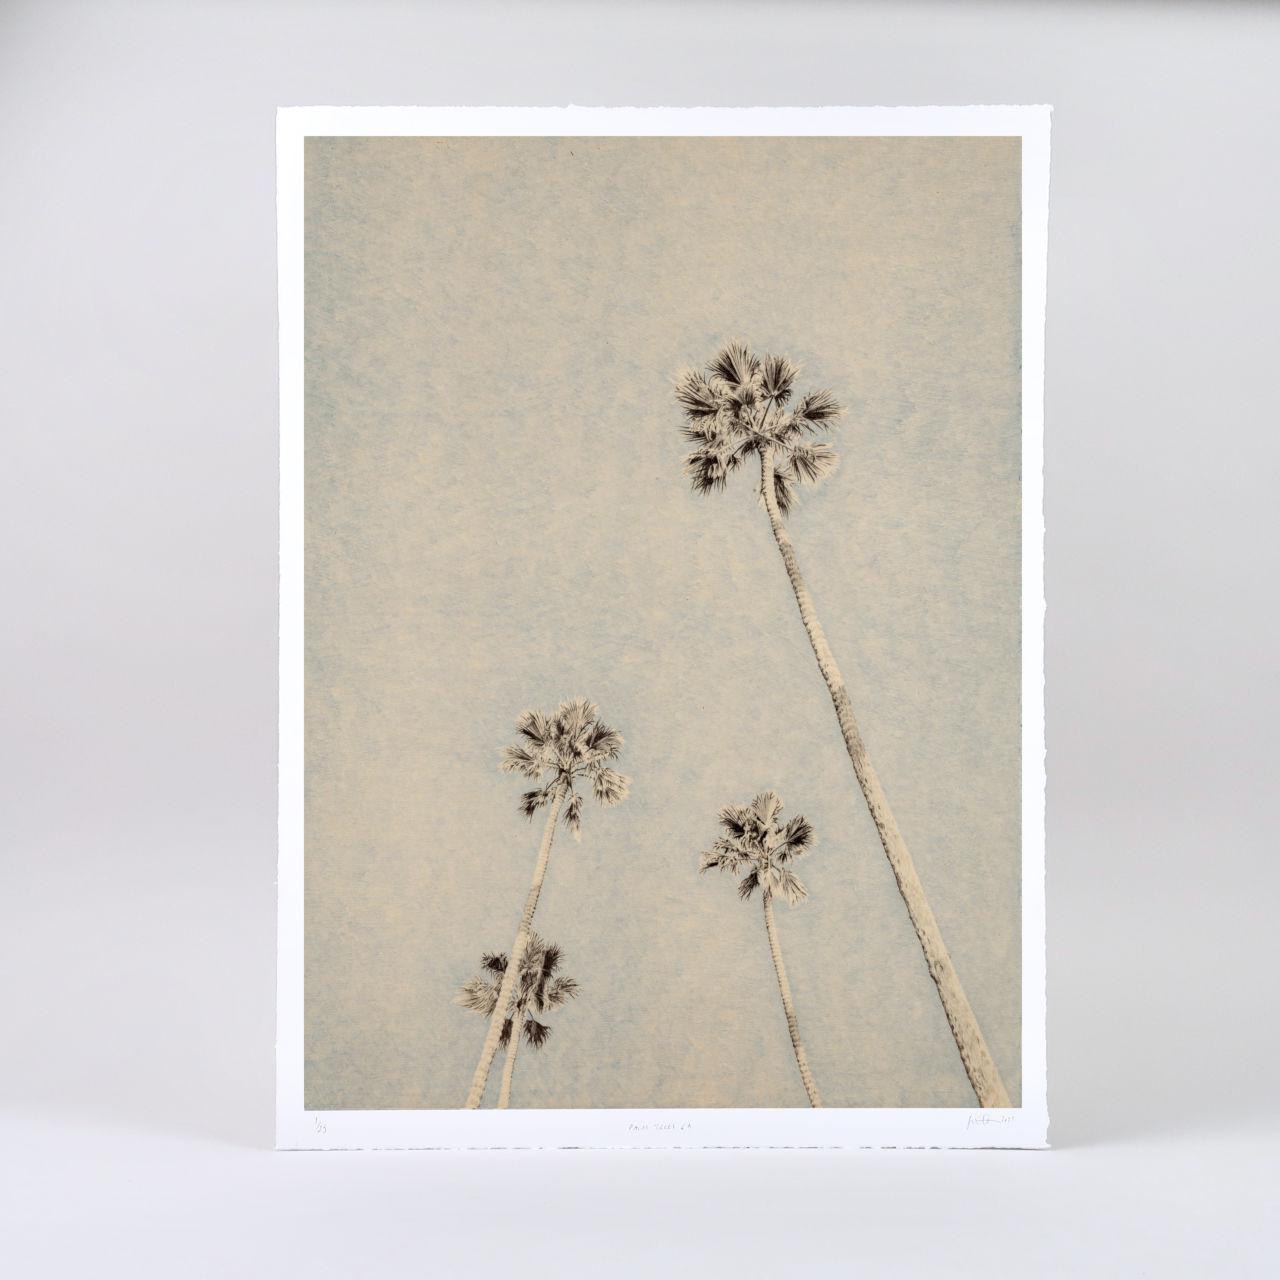 Limited Edition Giclée Print - Palm Trees L.A.